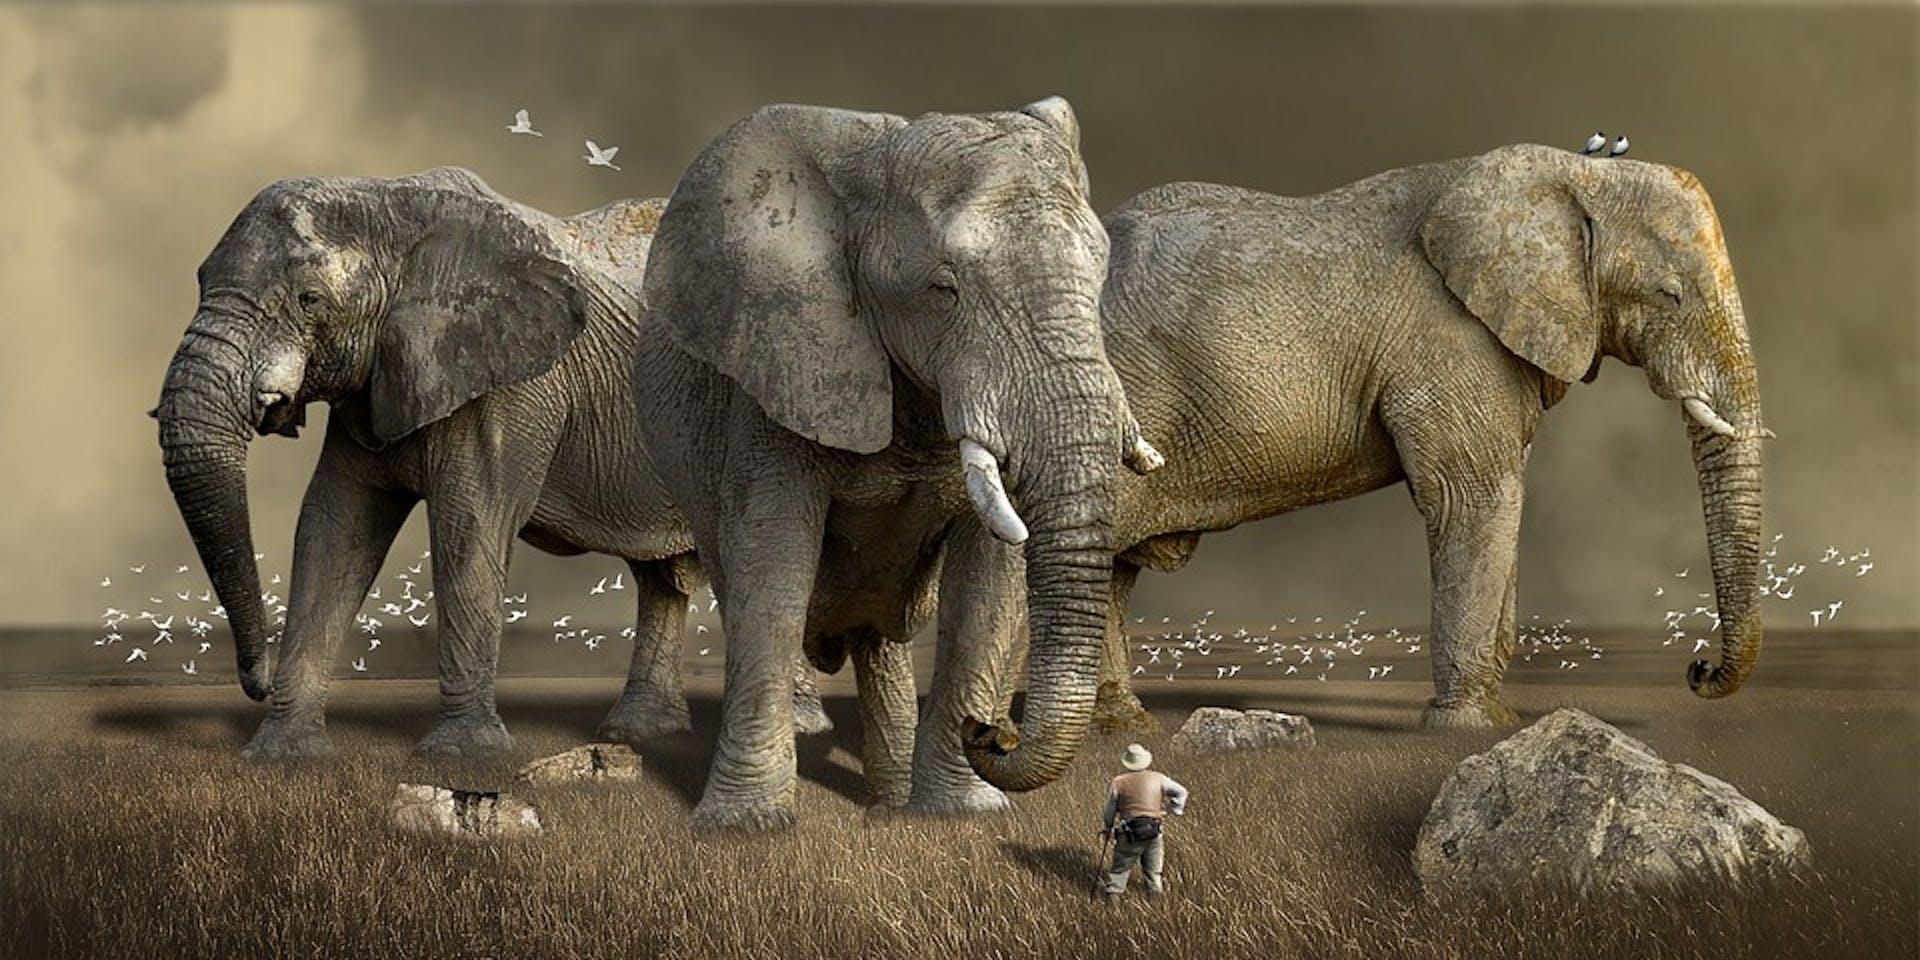 elephant ivory cartel dna evidence poachers